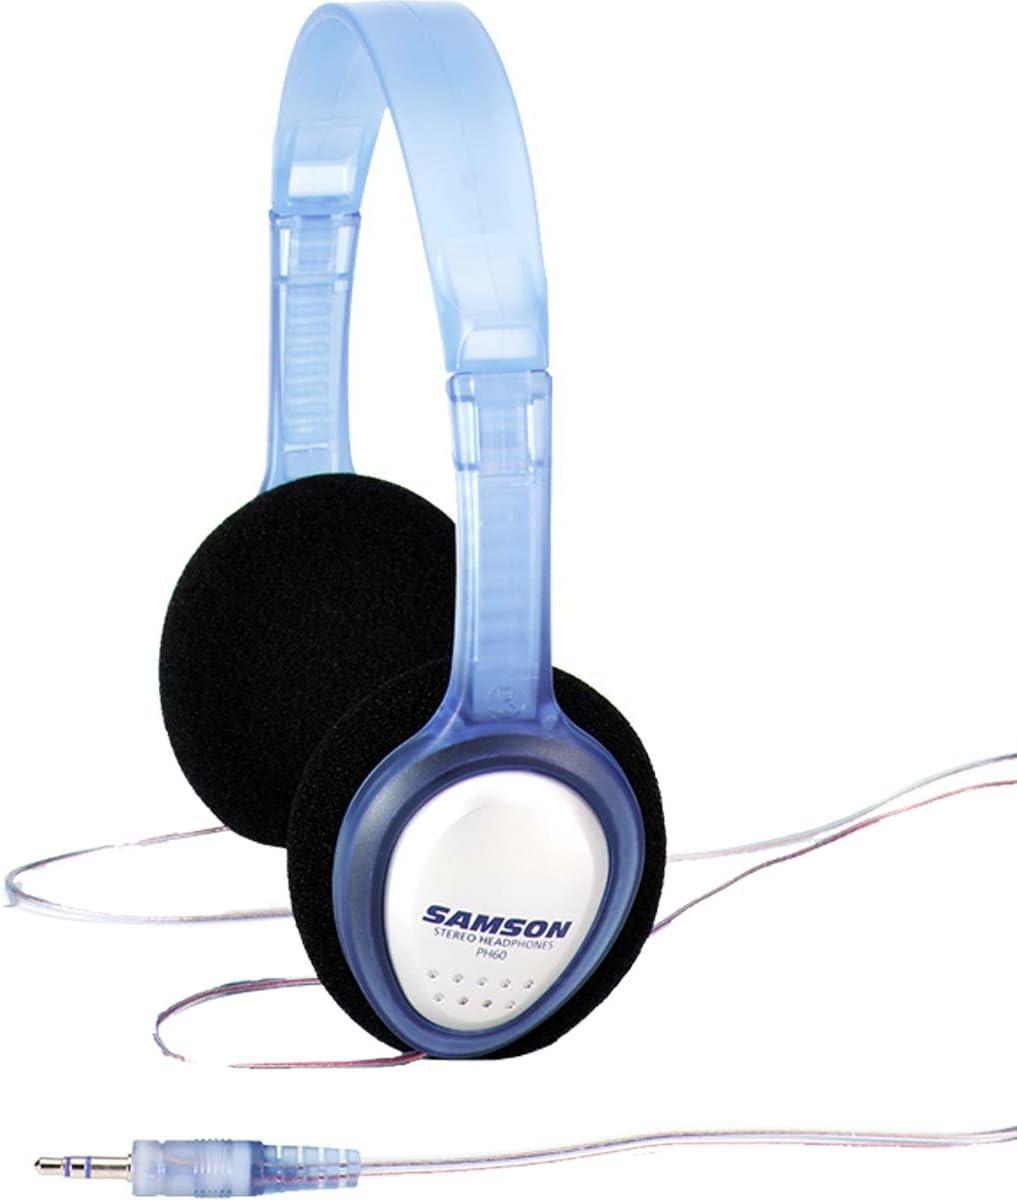 Keepdrum ms106/BK Micr/ófono Soporte Tr/ípode con jirafa y metal de socket Samson PH60/Auriculares est/éreo